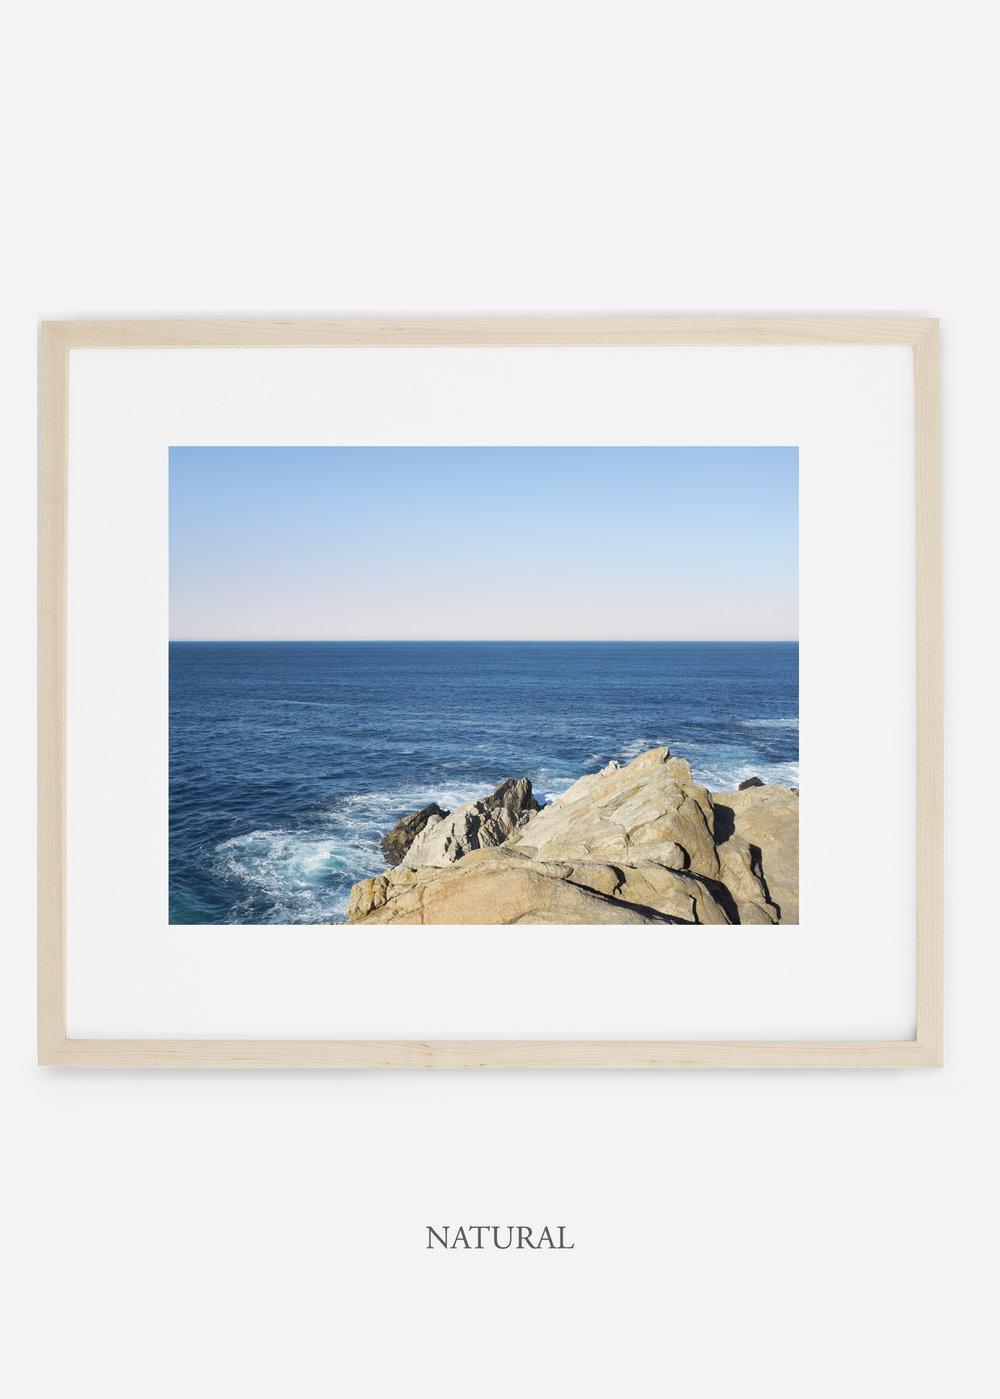 WilderCalifornia_naturalframe_interiordesign_oceanprint_PacificOceanNo.2.jpg